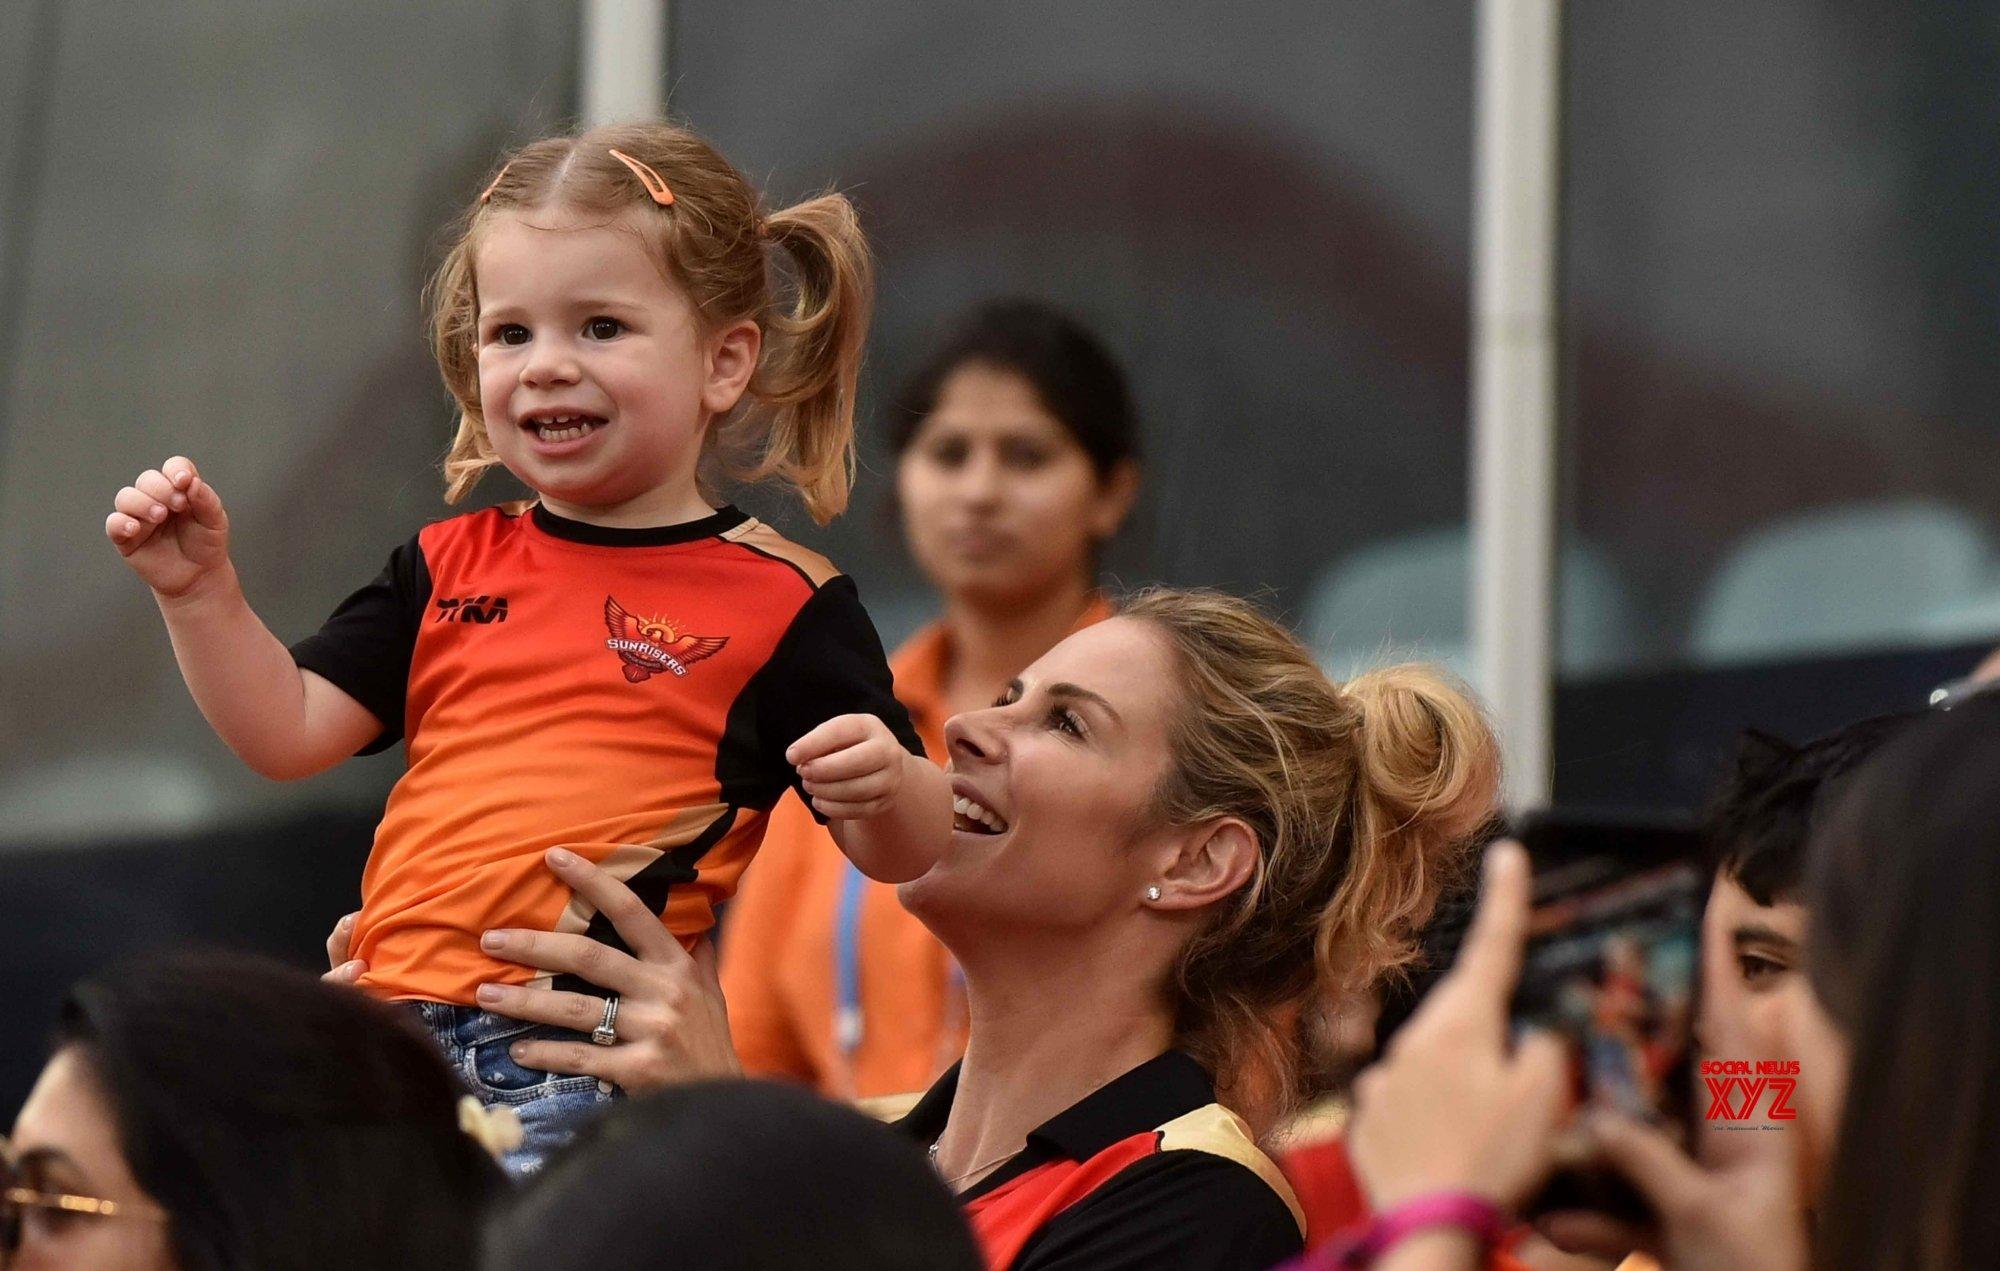 Warner's daughter wants to be Kohli